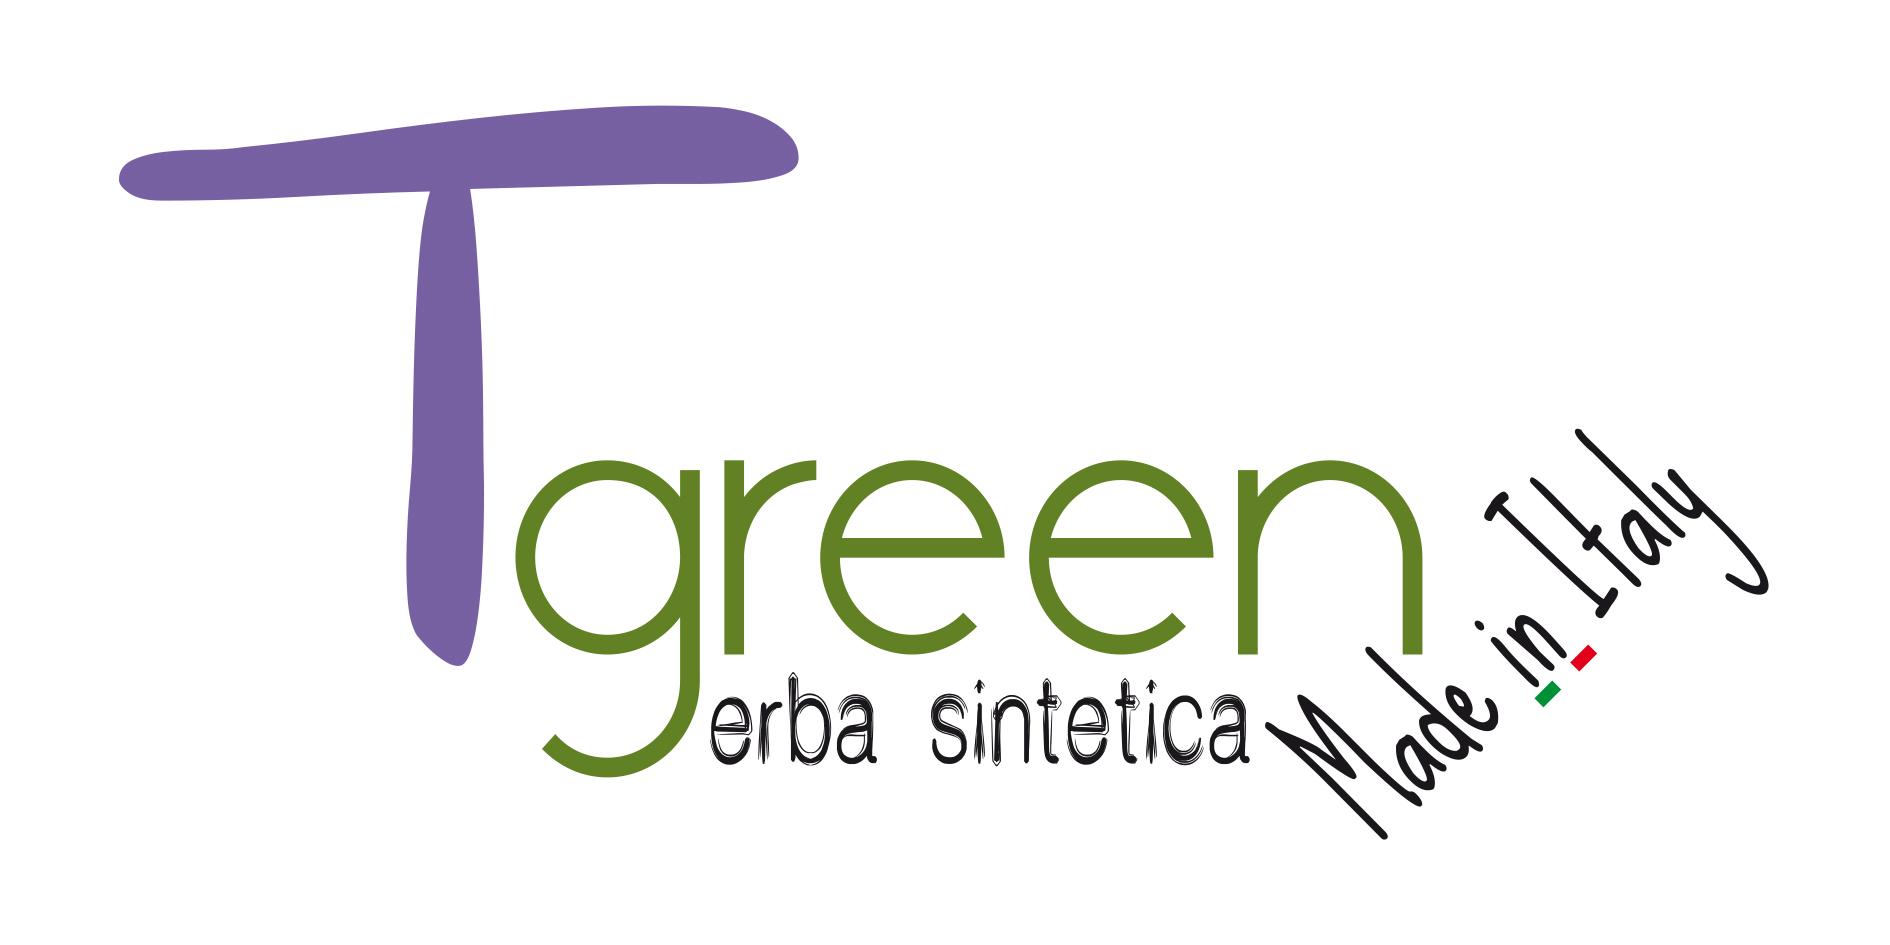 Tgreen